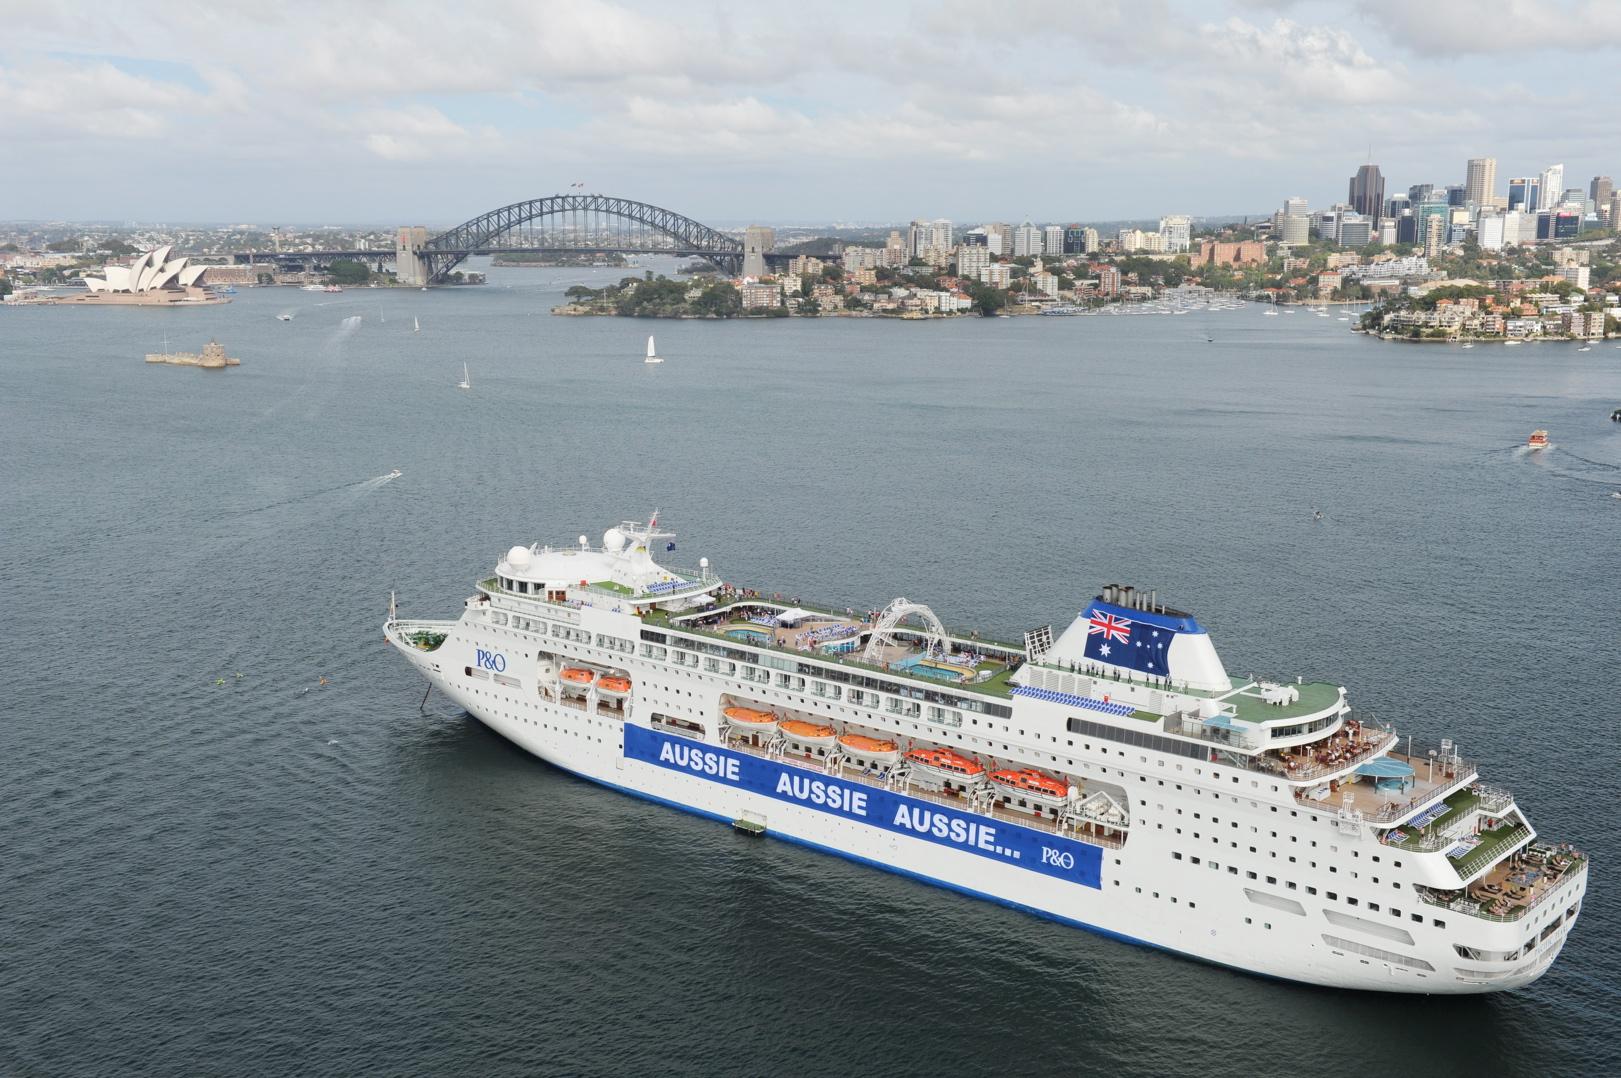 Australia S Aussiest Cruises Cruise Weekly